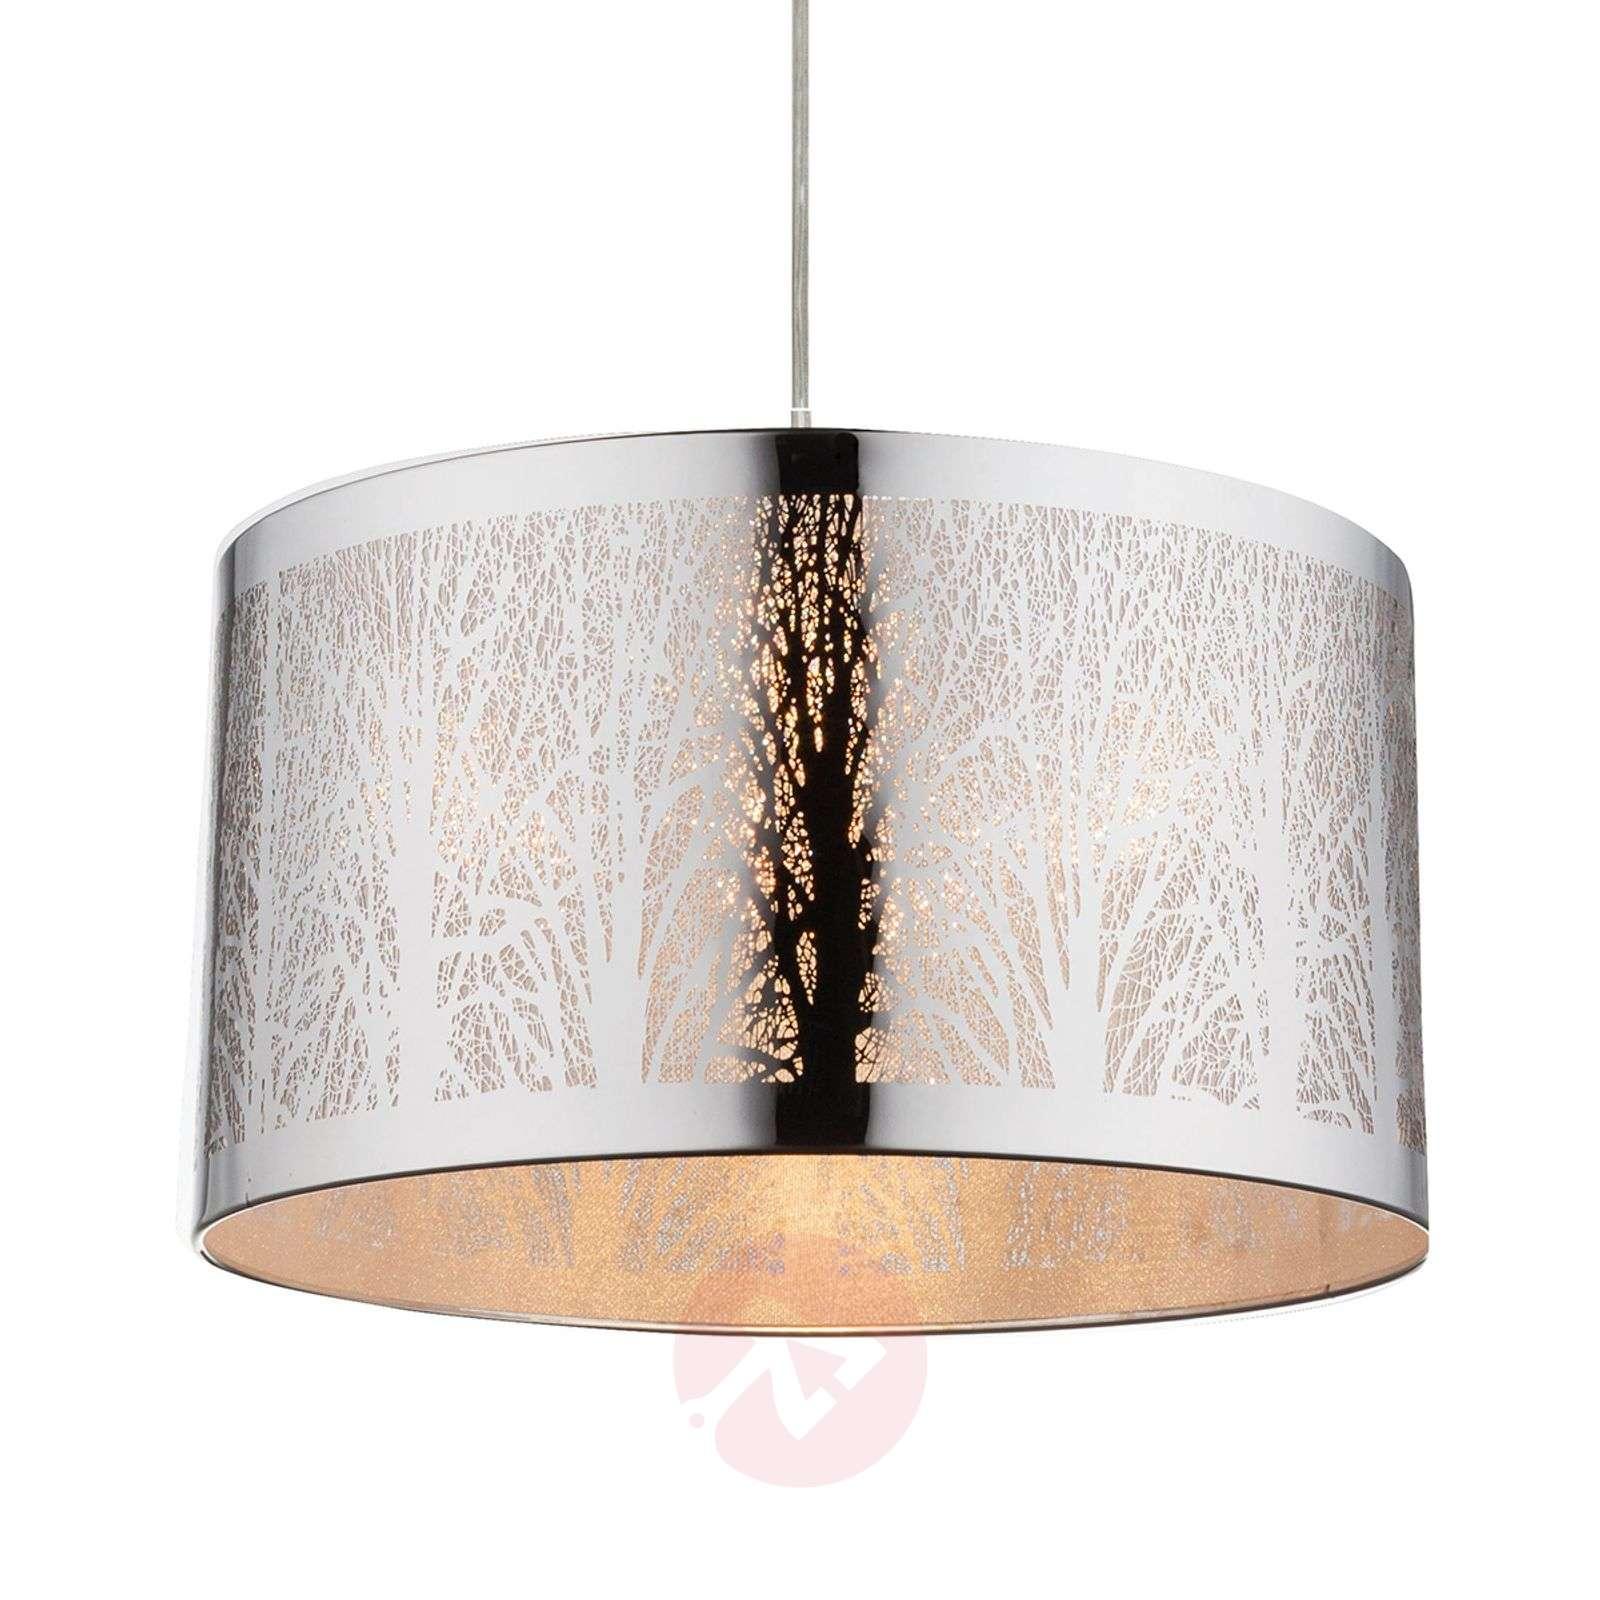 Tree pattern hanging light Cianna-4014830-01